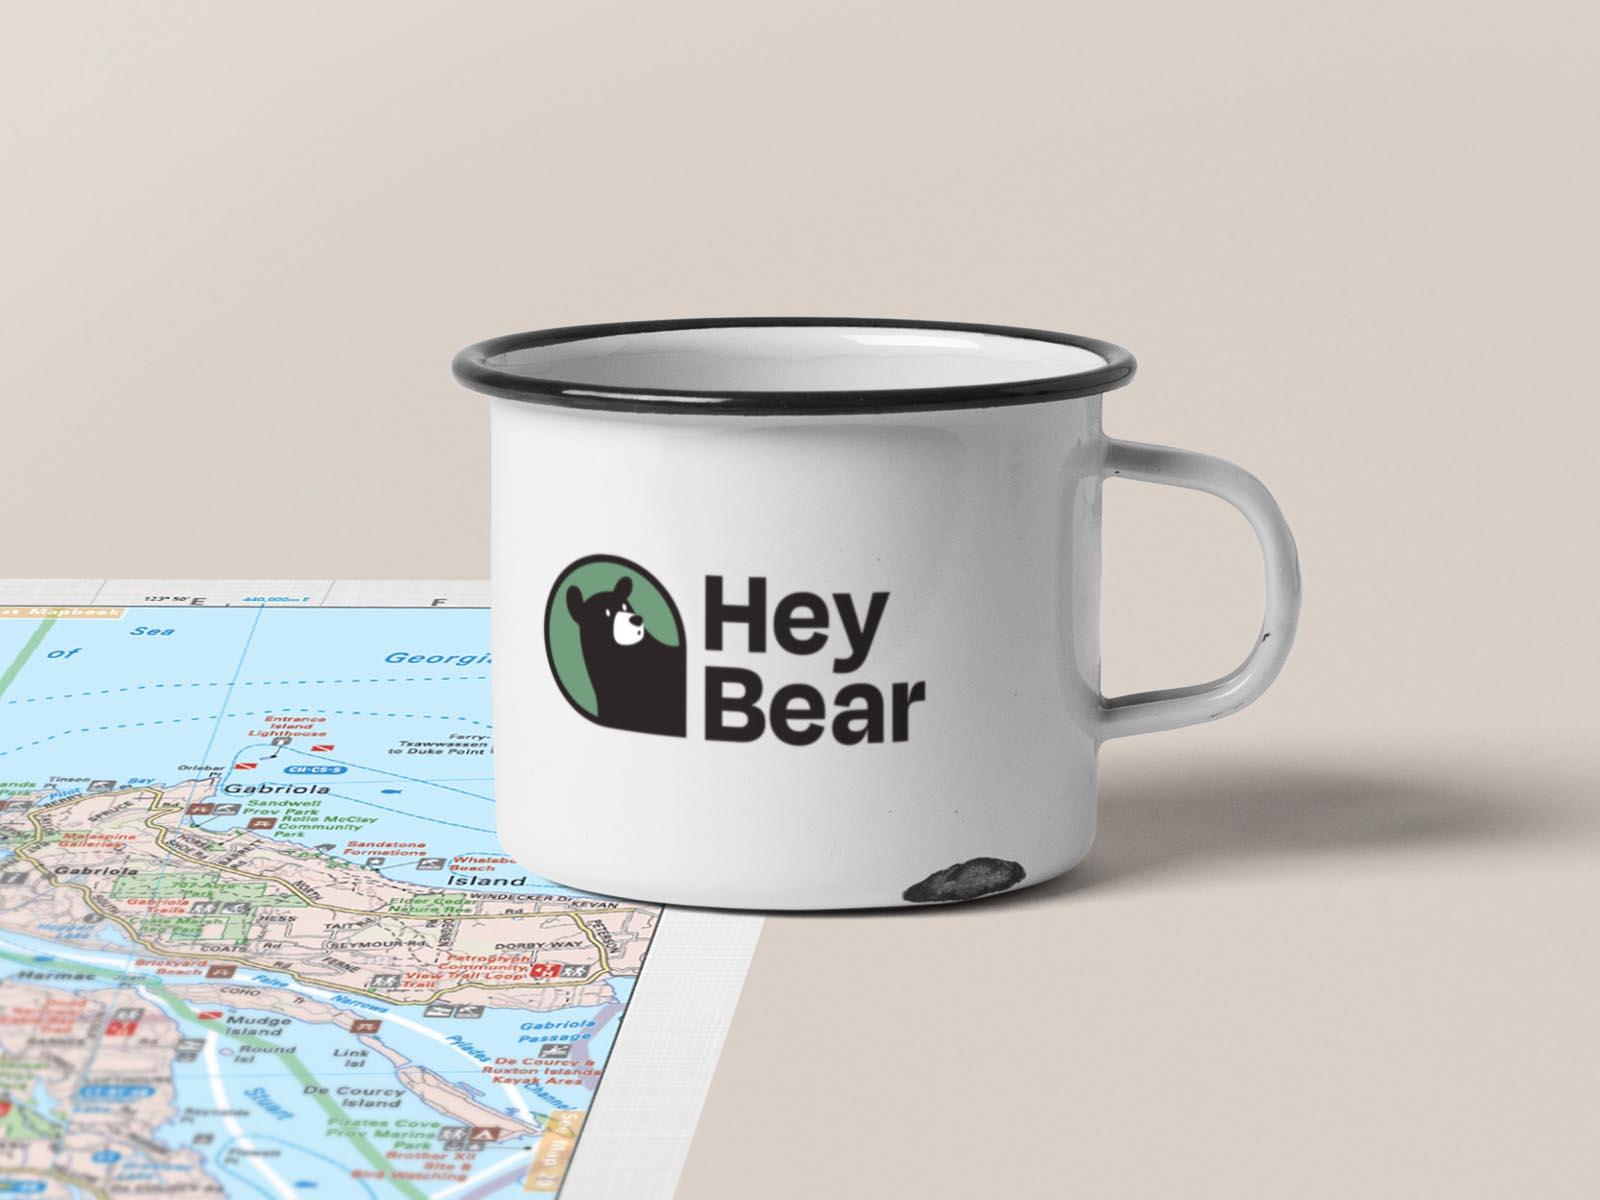 logo on travel mug for hey bear logo design project